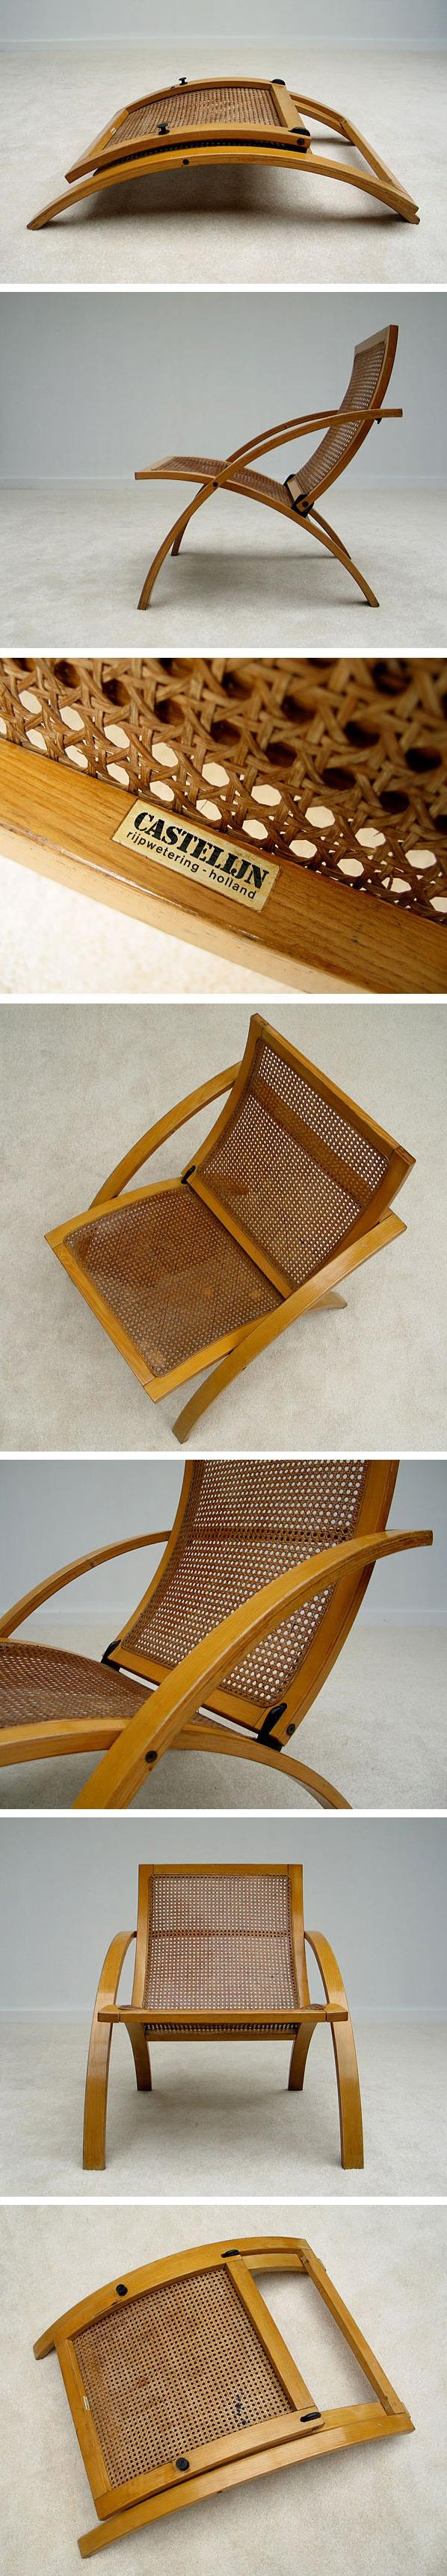 Folding chair Gijs Bakker Castelijn 1976 Large